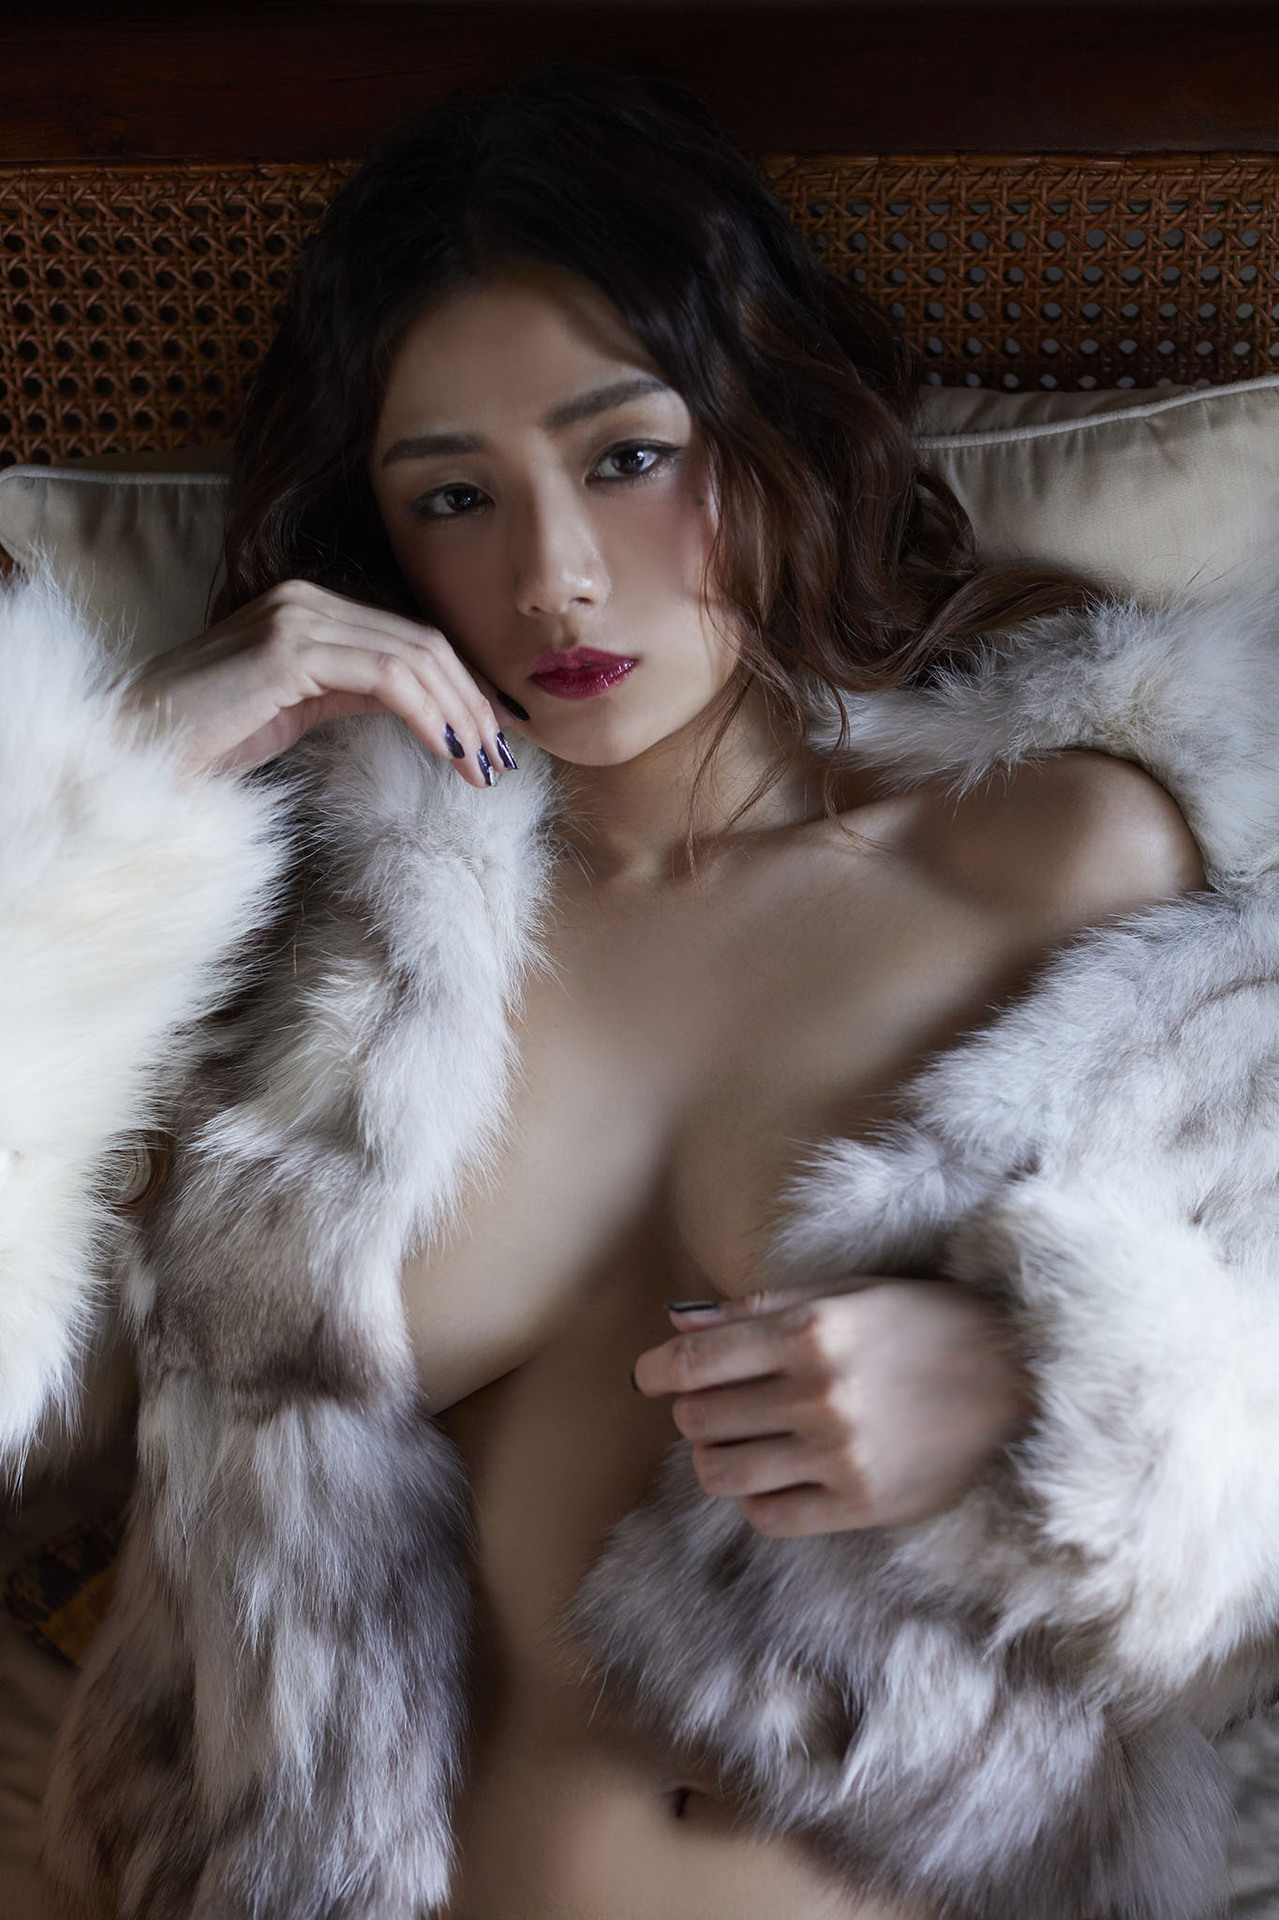 片山萌美 Poker Face 00028